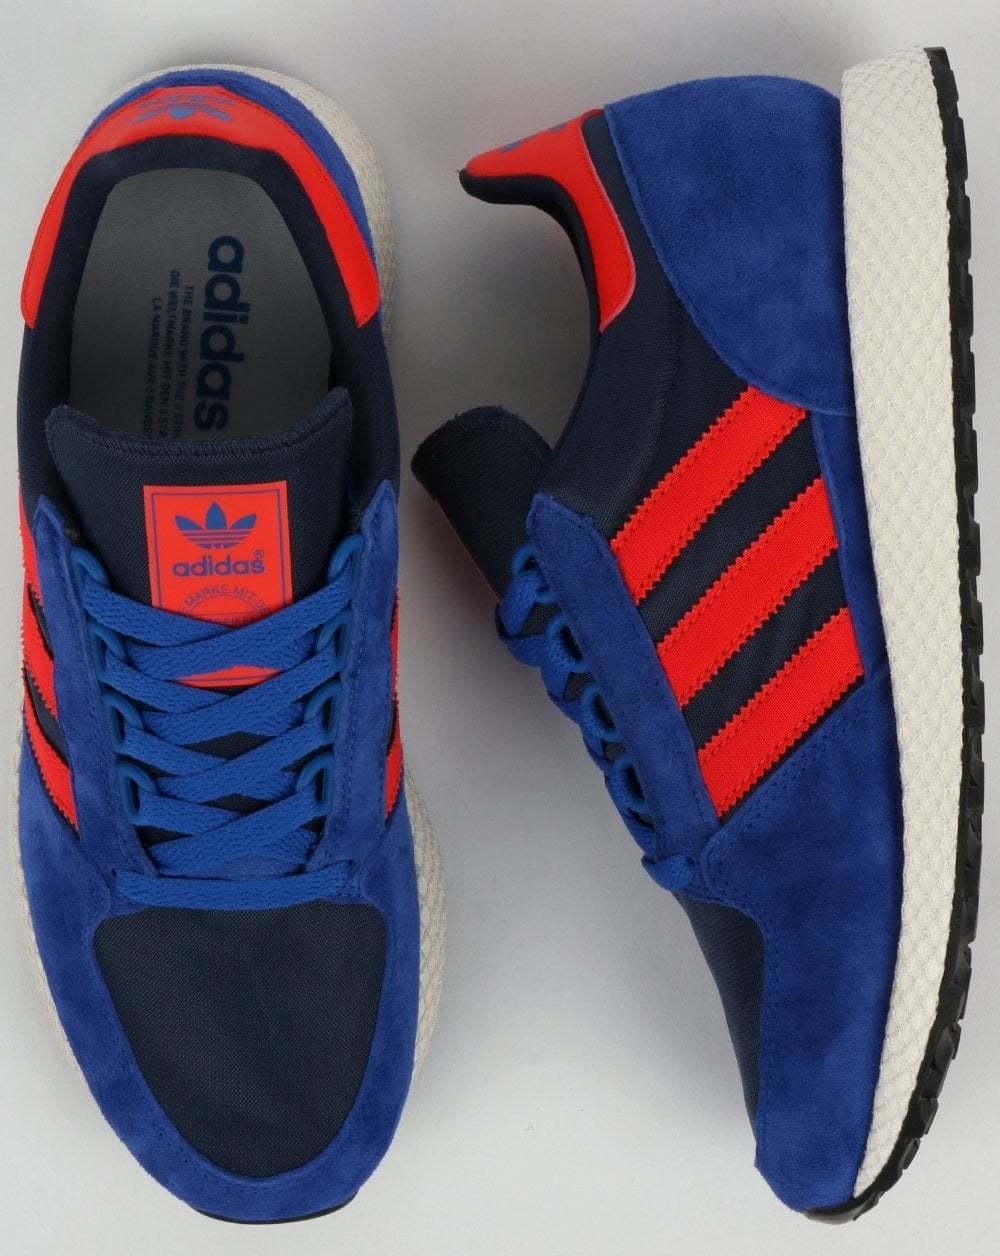 Adidas Originals Forest Grove - Navy, Power Blau & rot - BNIBWT